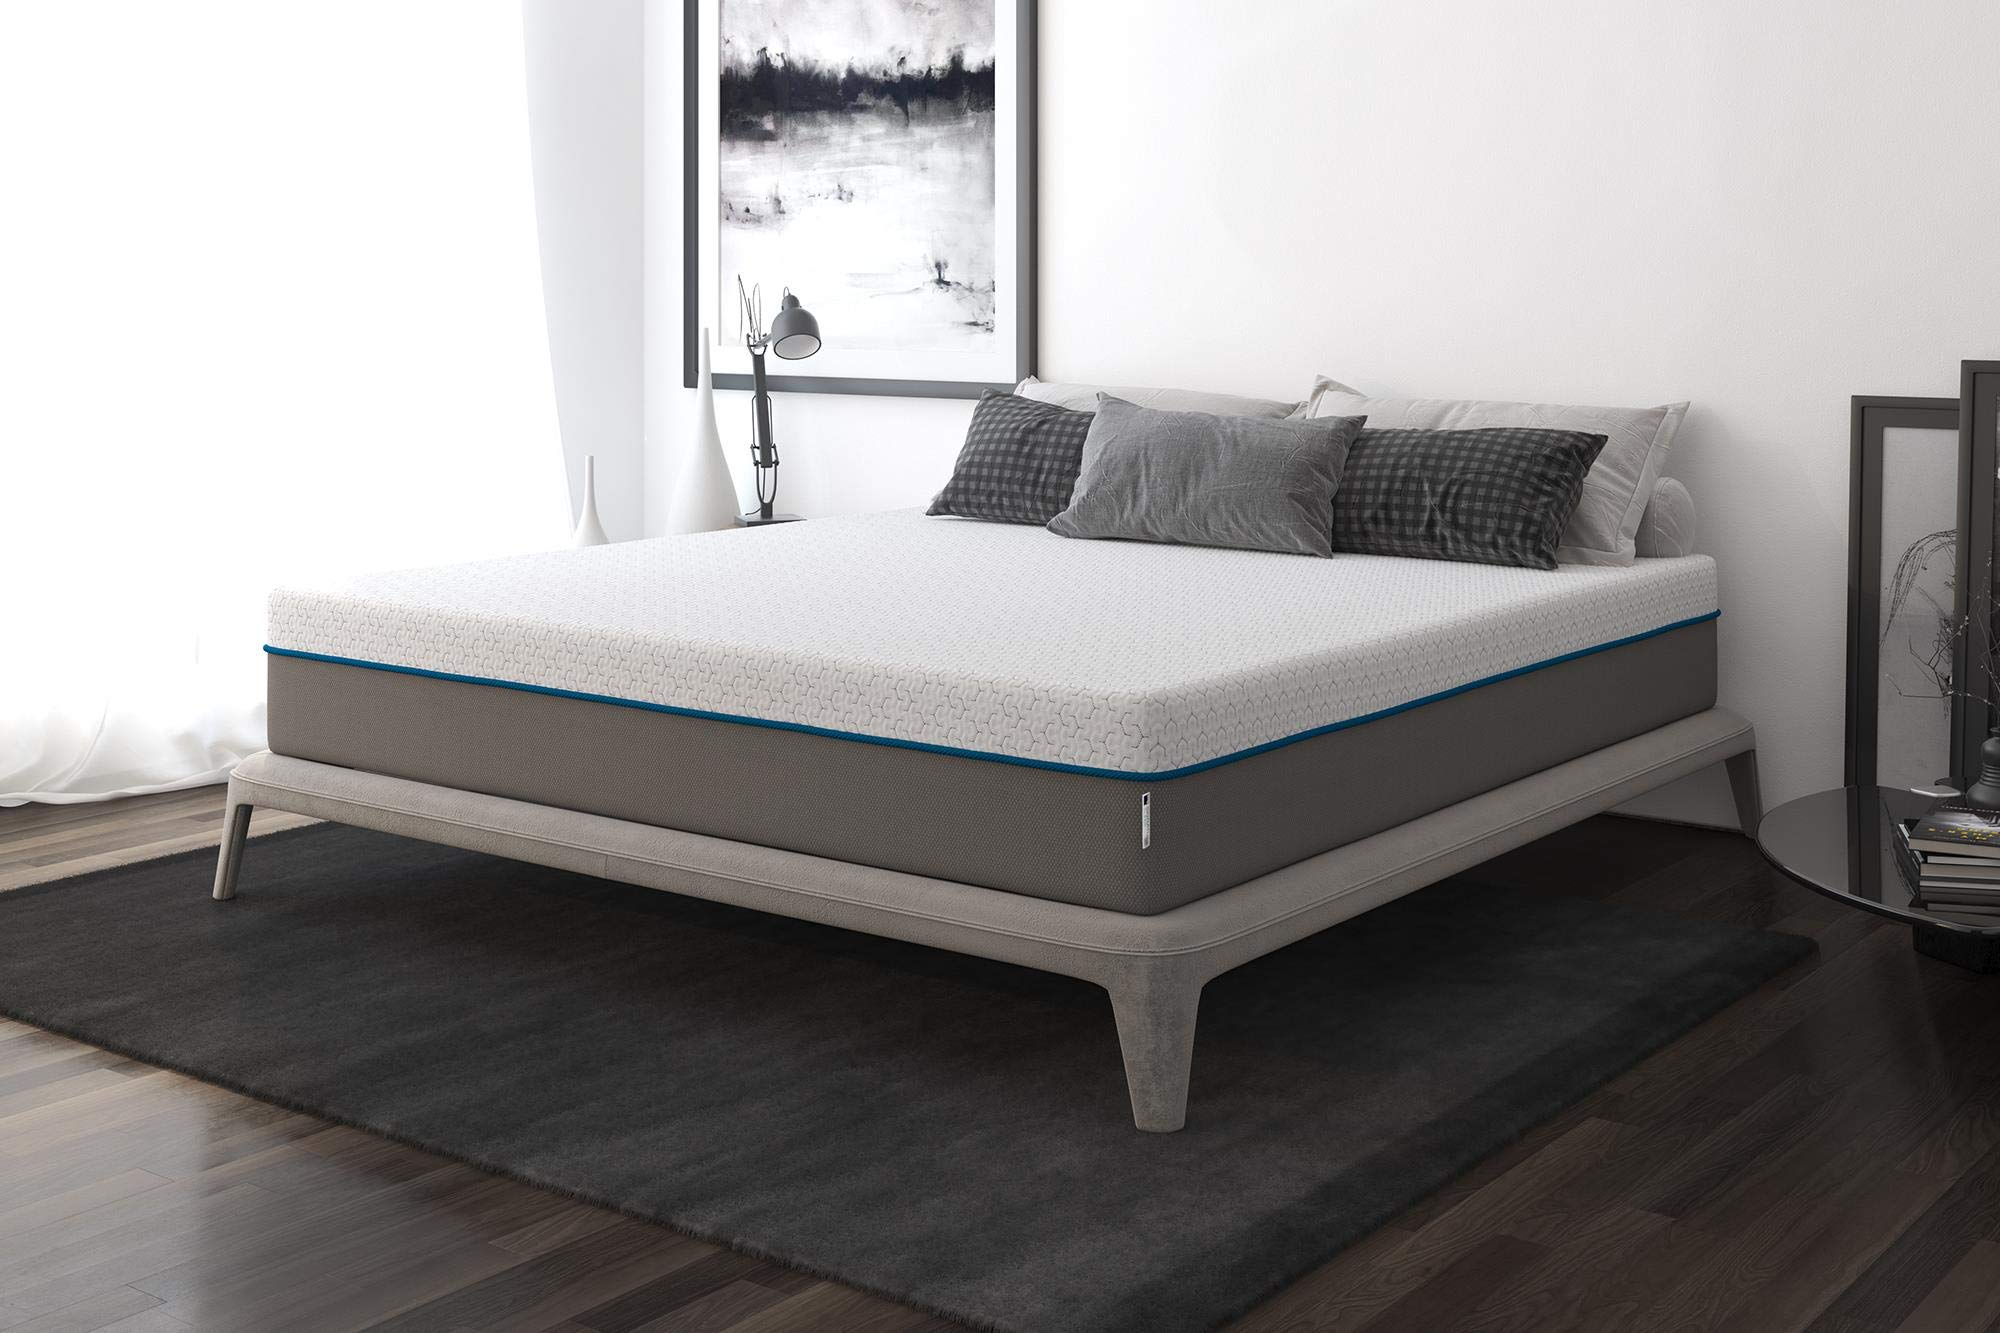 Signature Sleep Flex 12-Inch Charcoal Gel Memory Foam Mattress, King Size